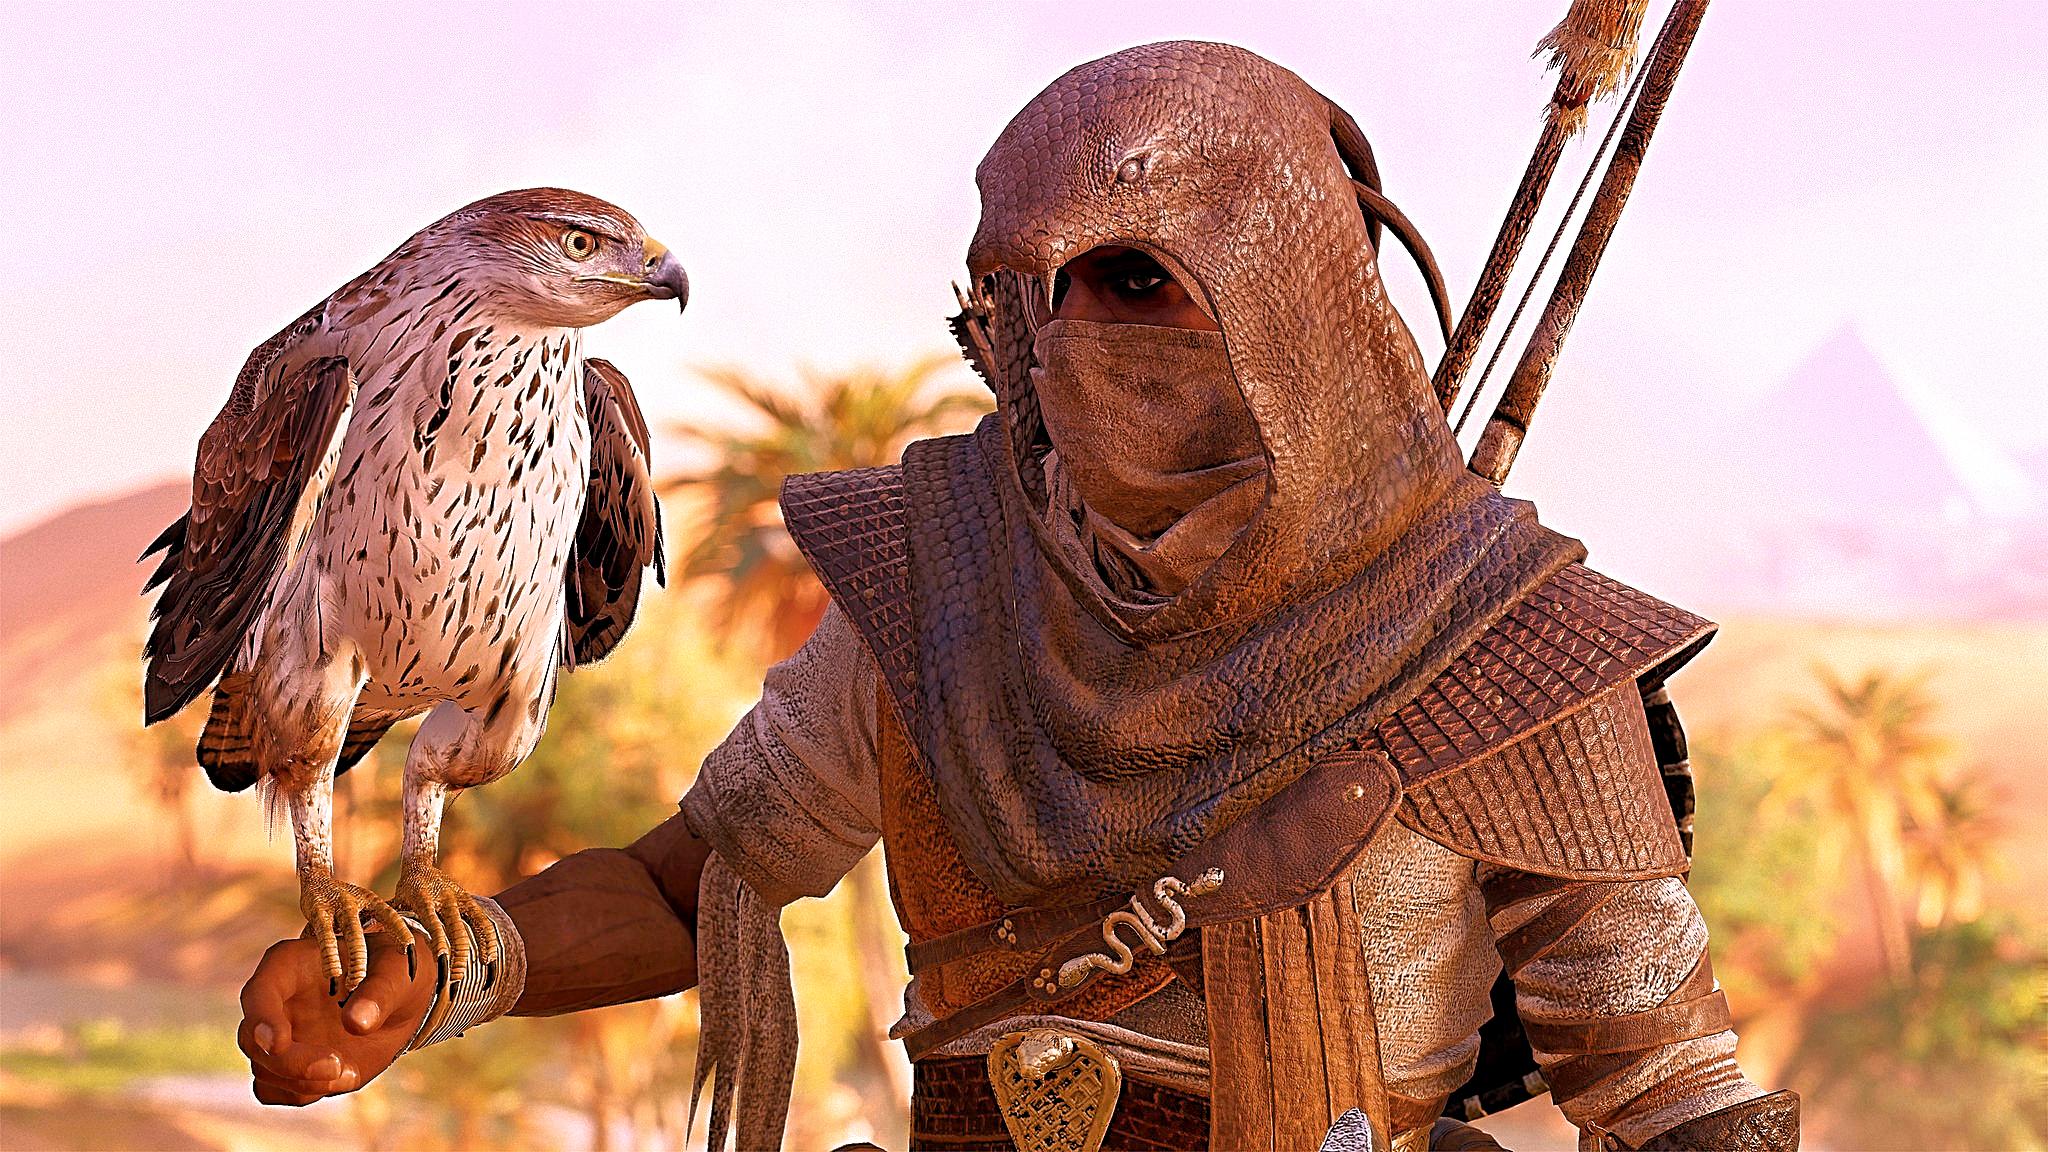 Assassin's Creed: Origins - Assassin's Creed: Origins